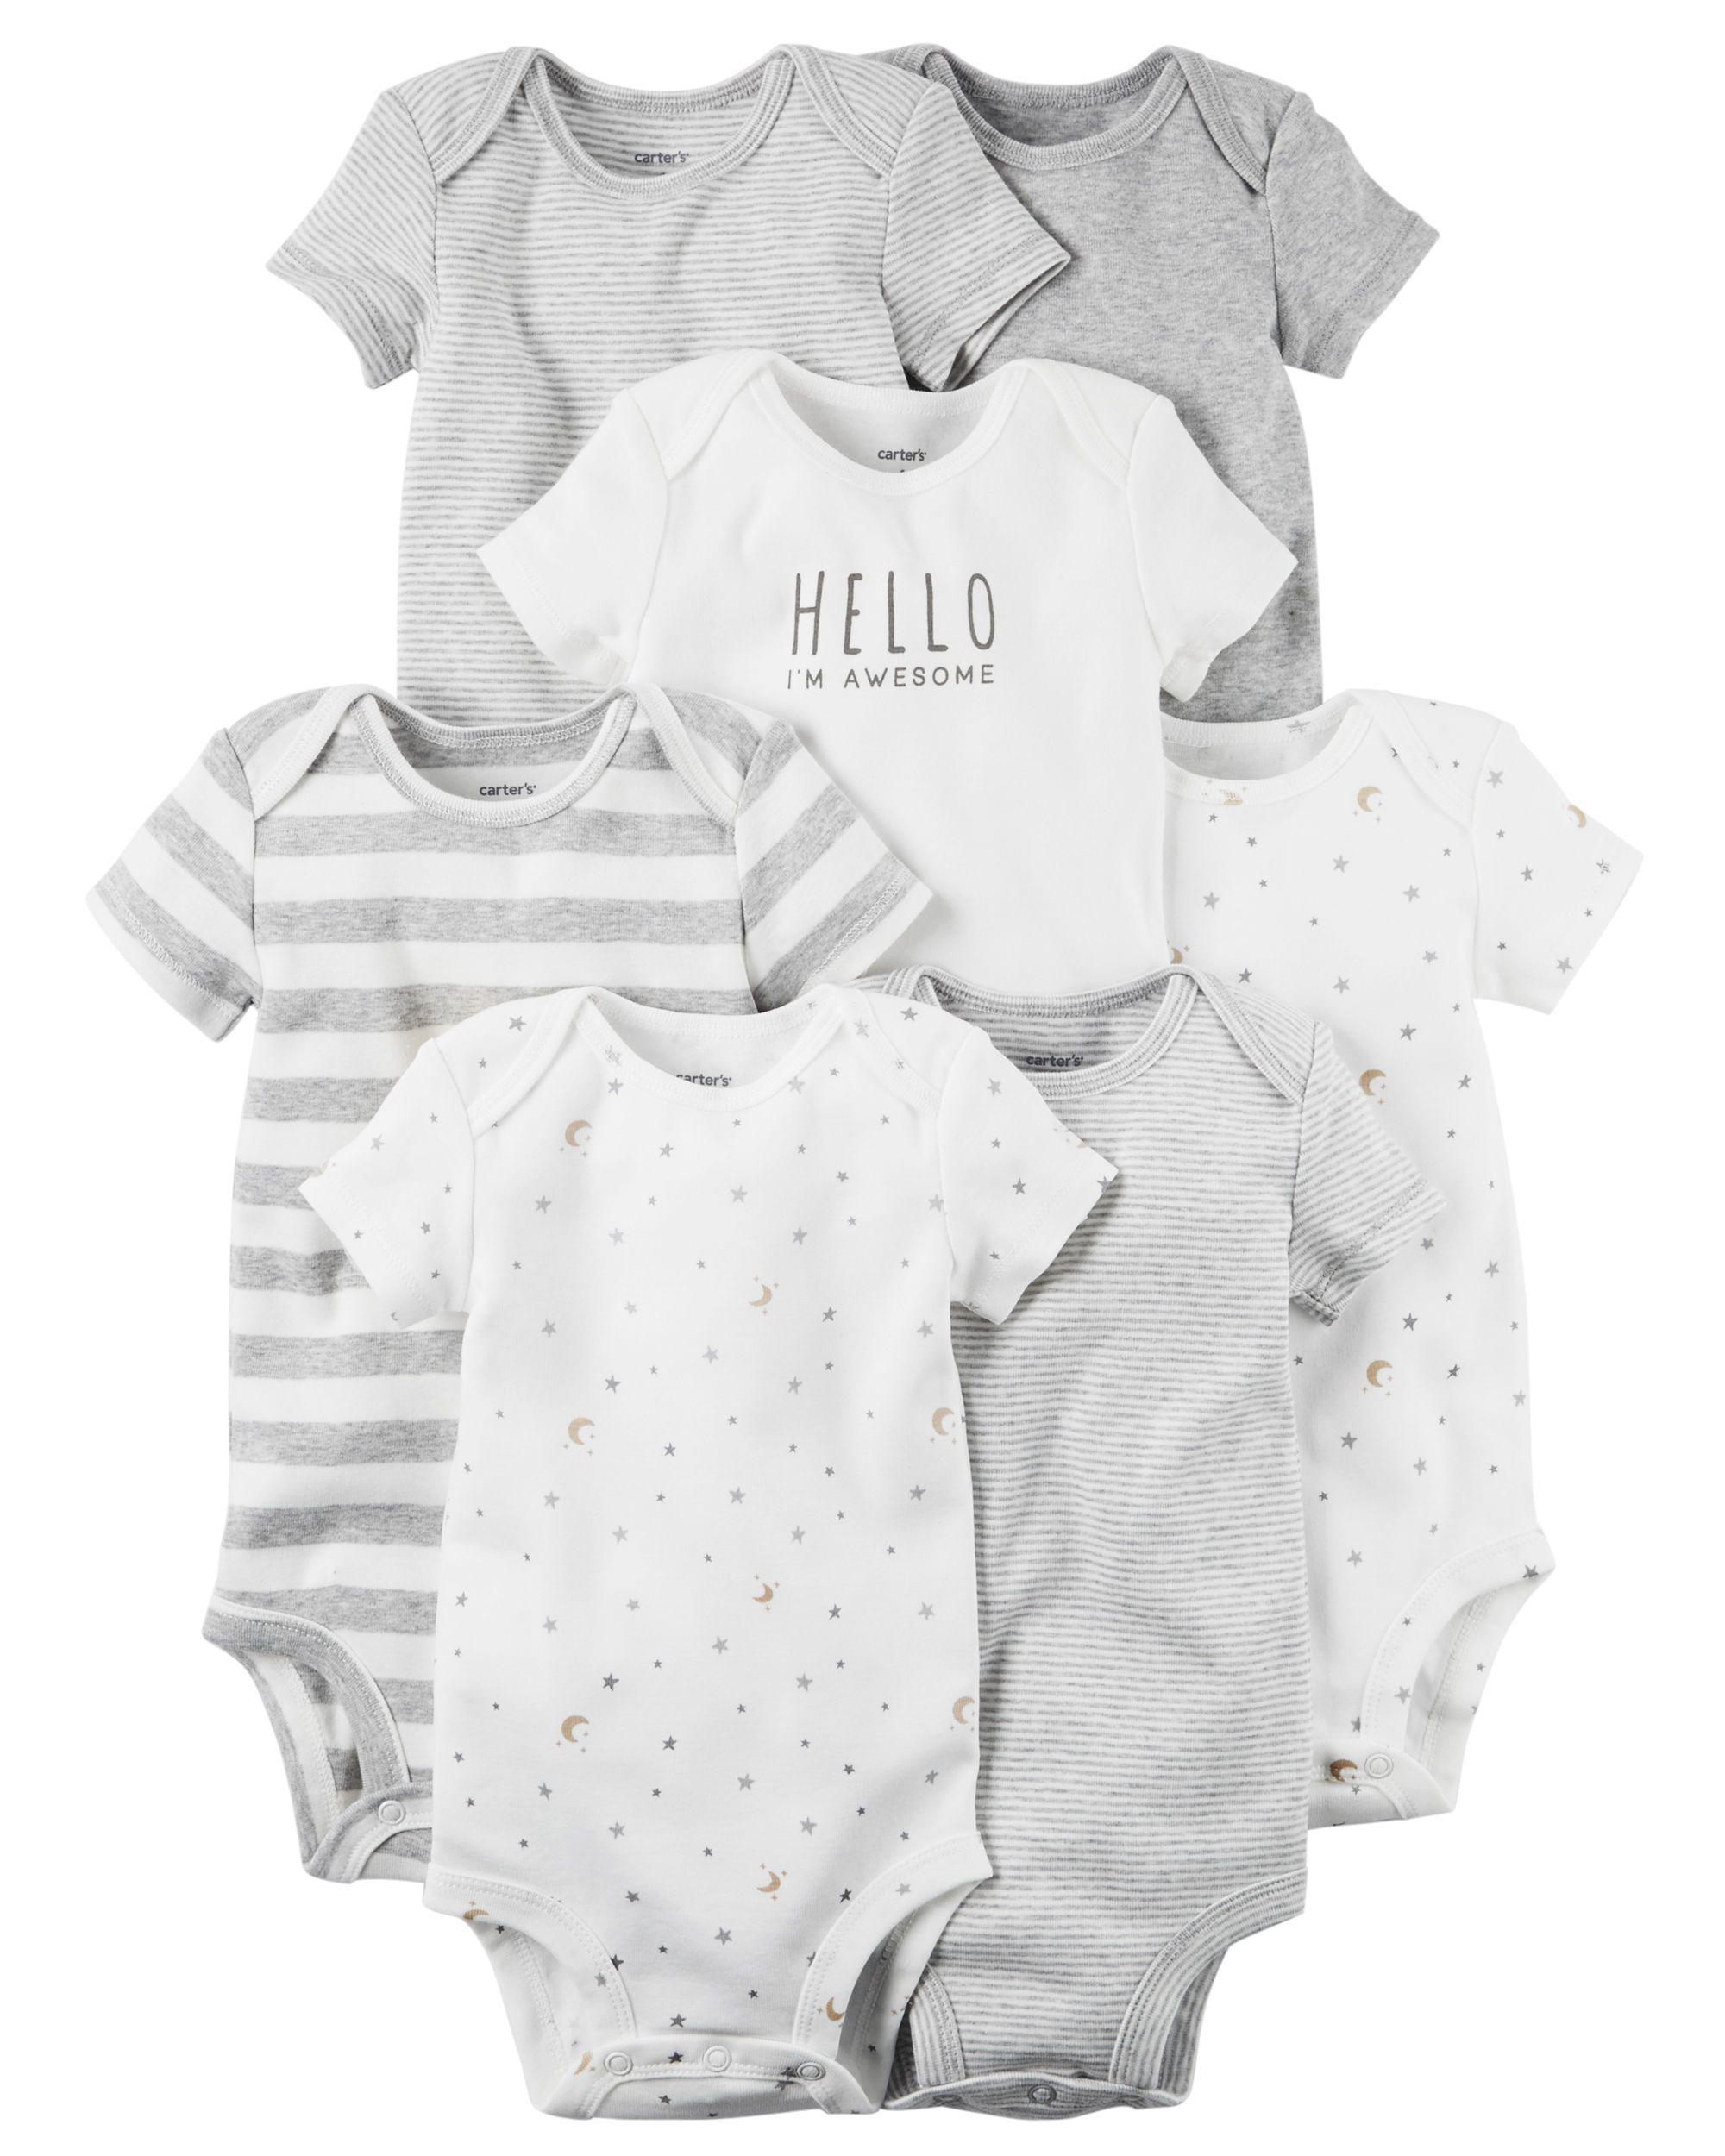 1b516eb04 7-Pack Short-Sleeve Original Bodysuits   Maternity and Baby Fashion ...